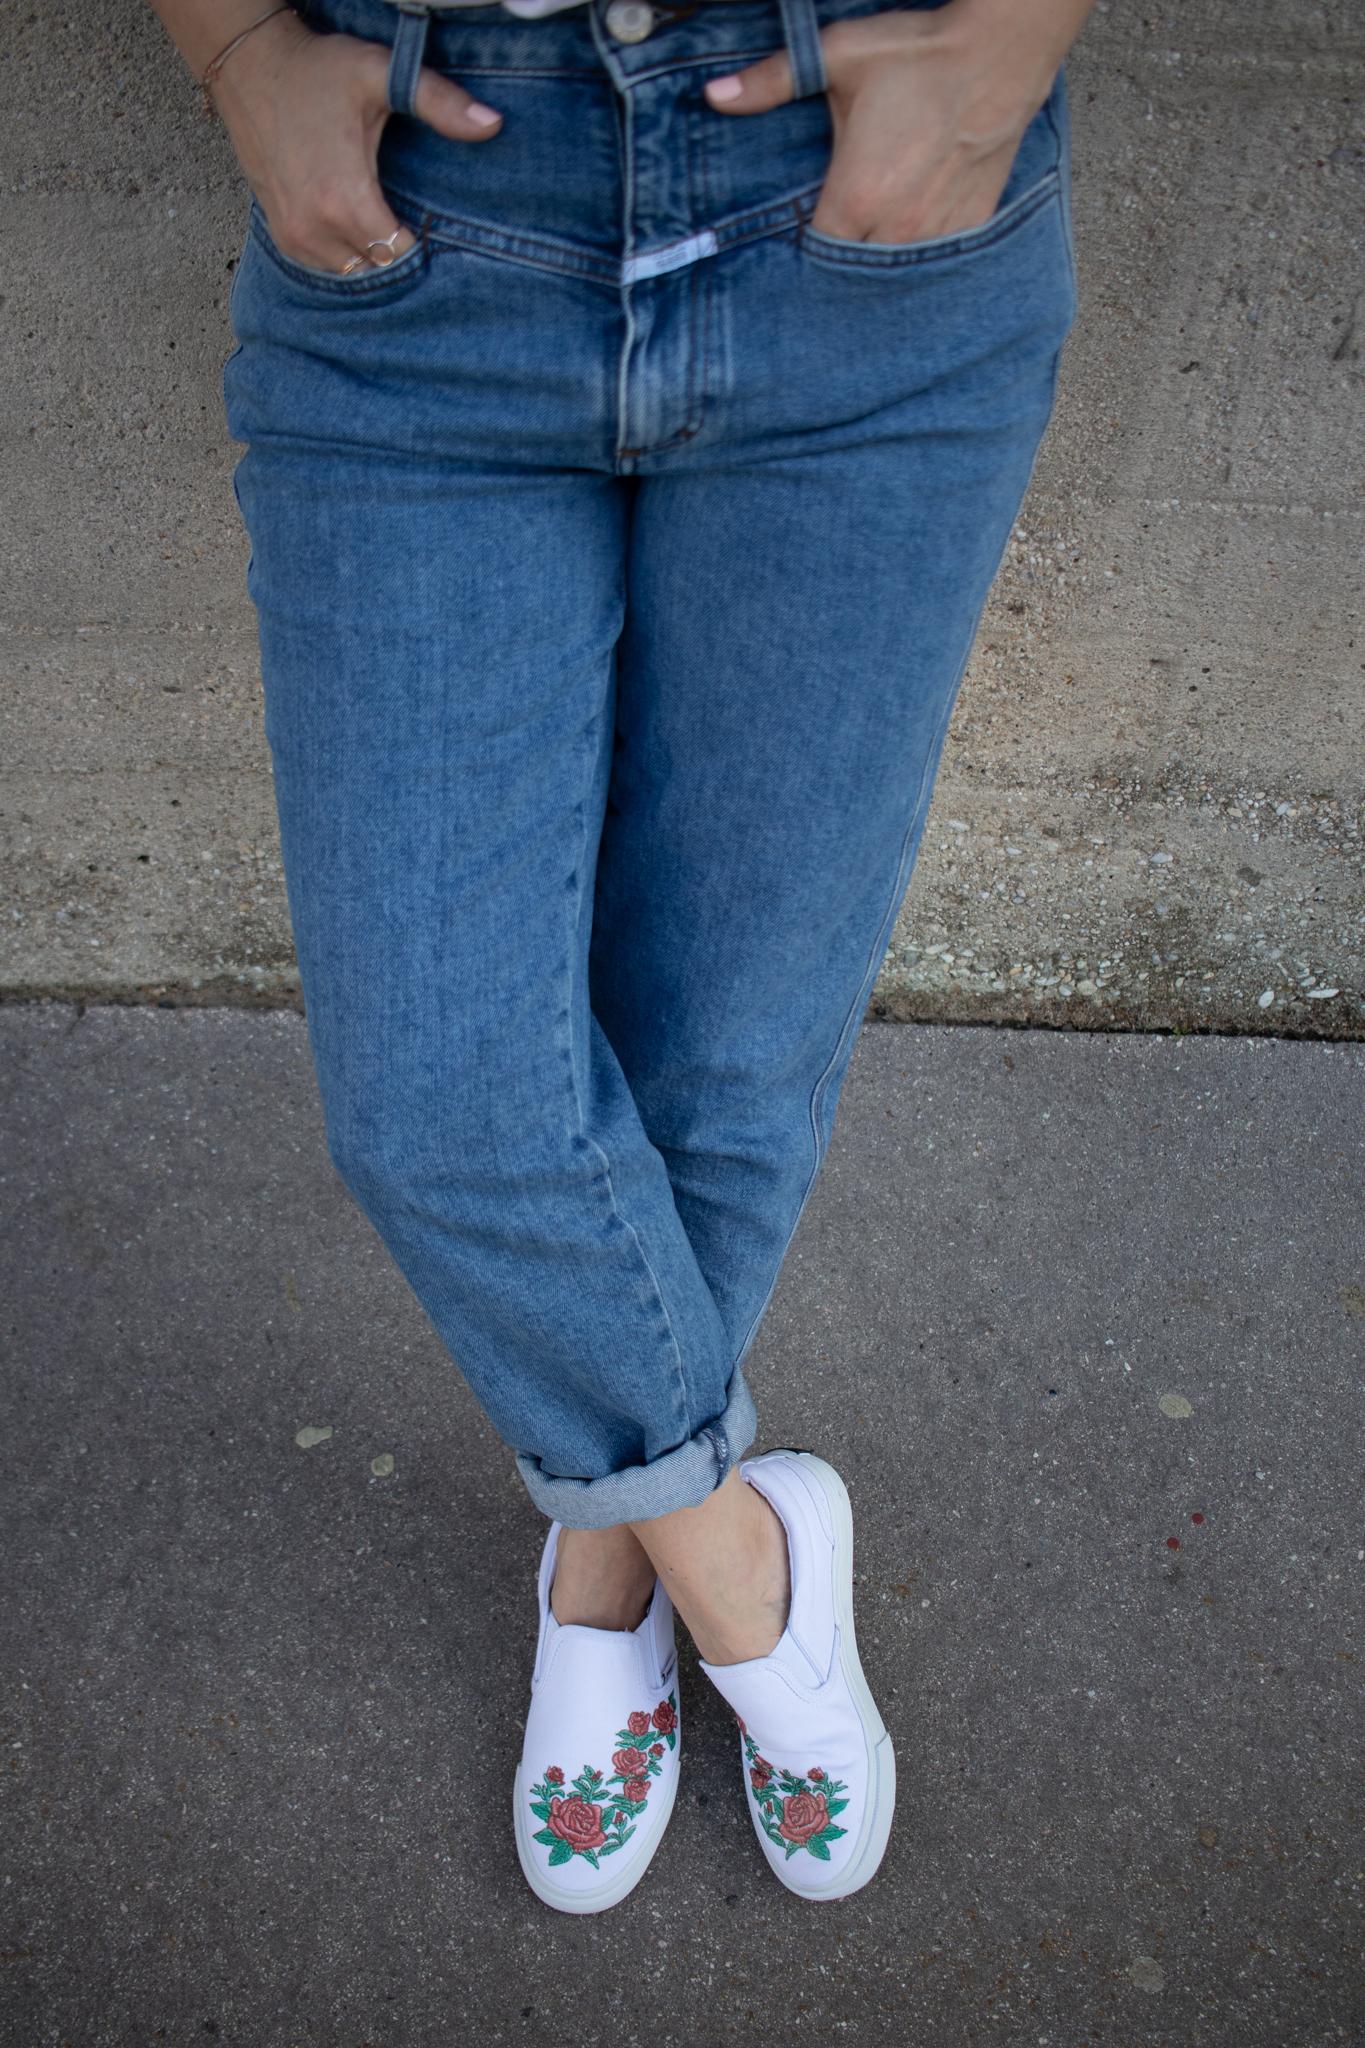 Fila Trend Sneakers für den Sommer, die auch bei Hitze super sind! Deichmann white Sneakers, closed jeans pedal pusher, ootd, streetstyle vienna_2019